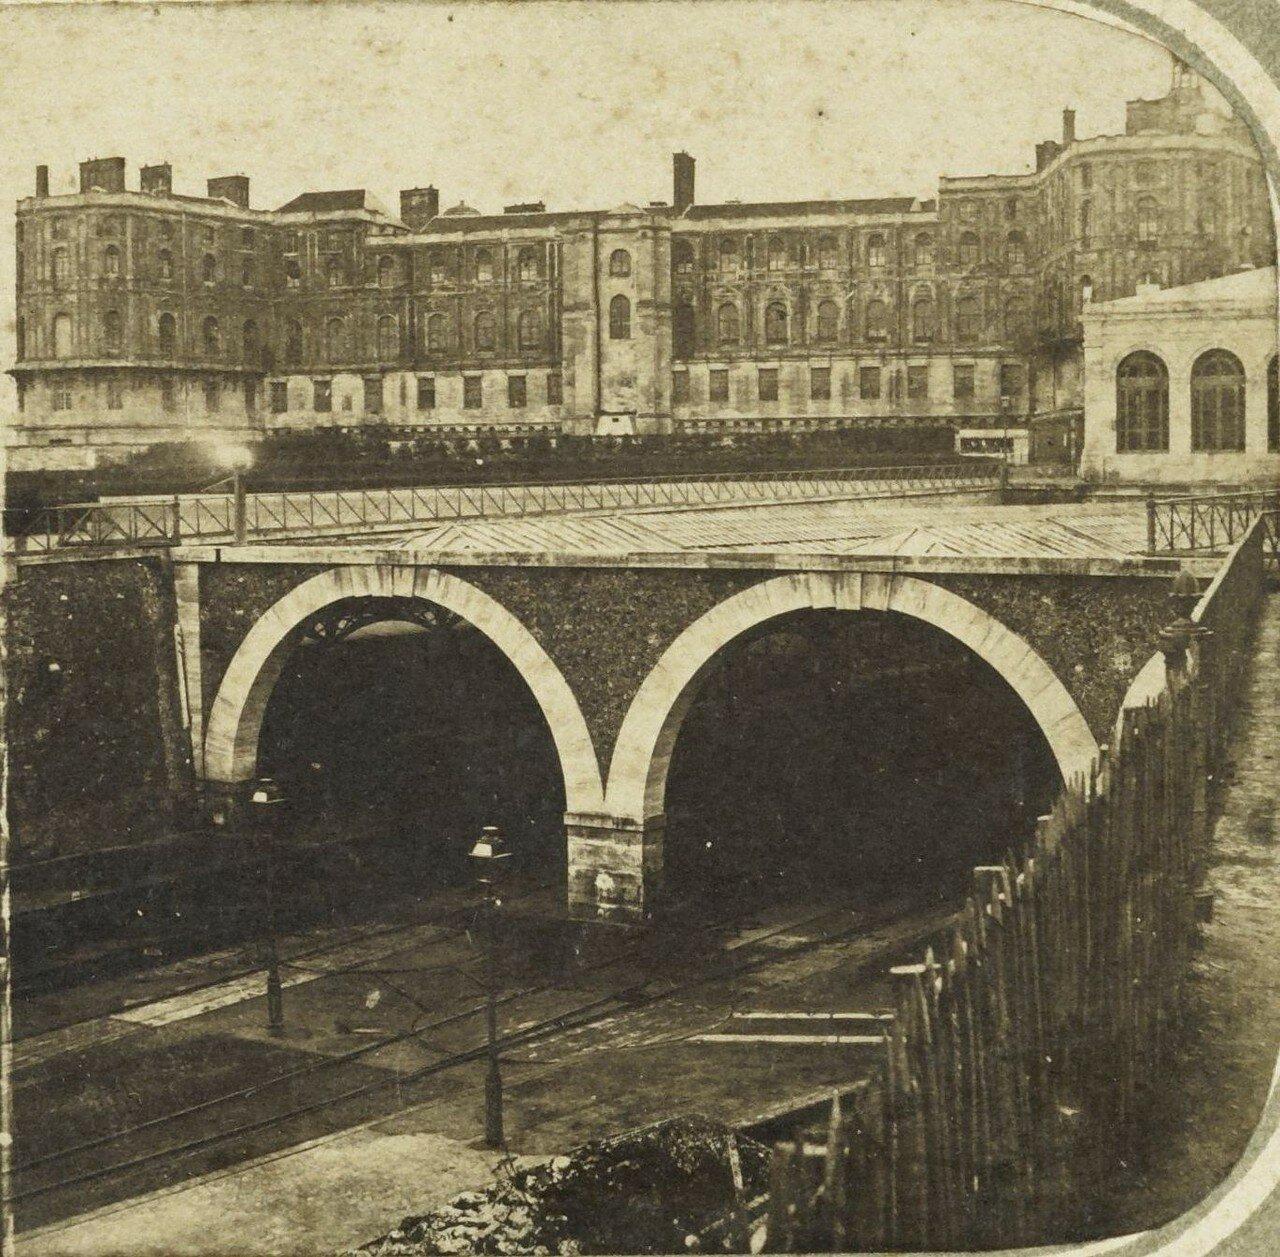 1855. Железная дорога в Сен-Жермен